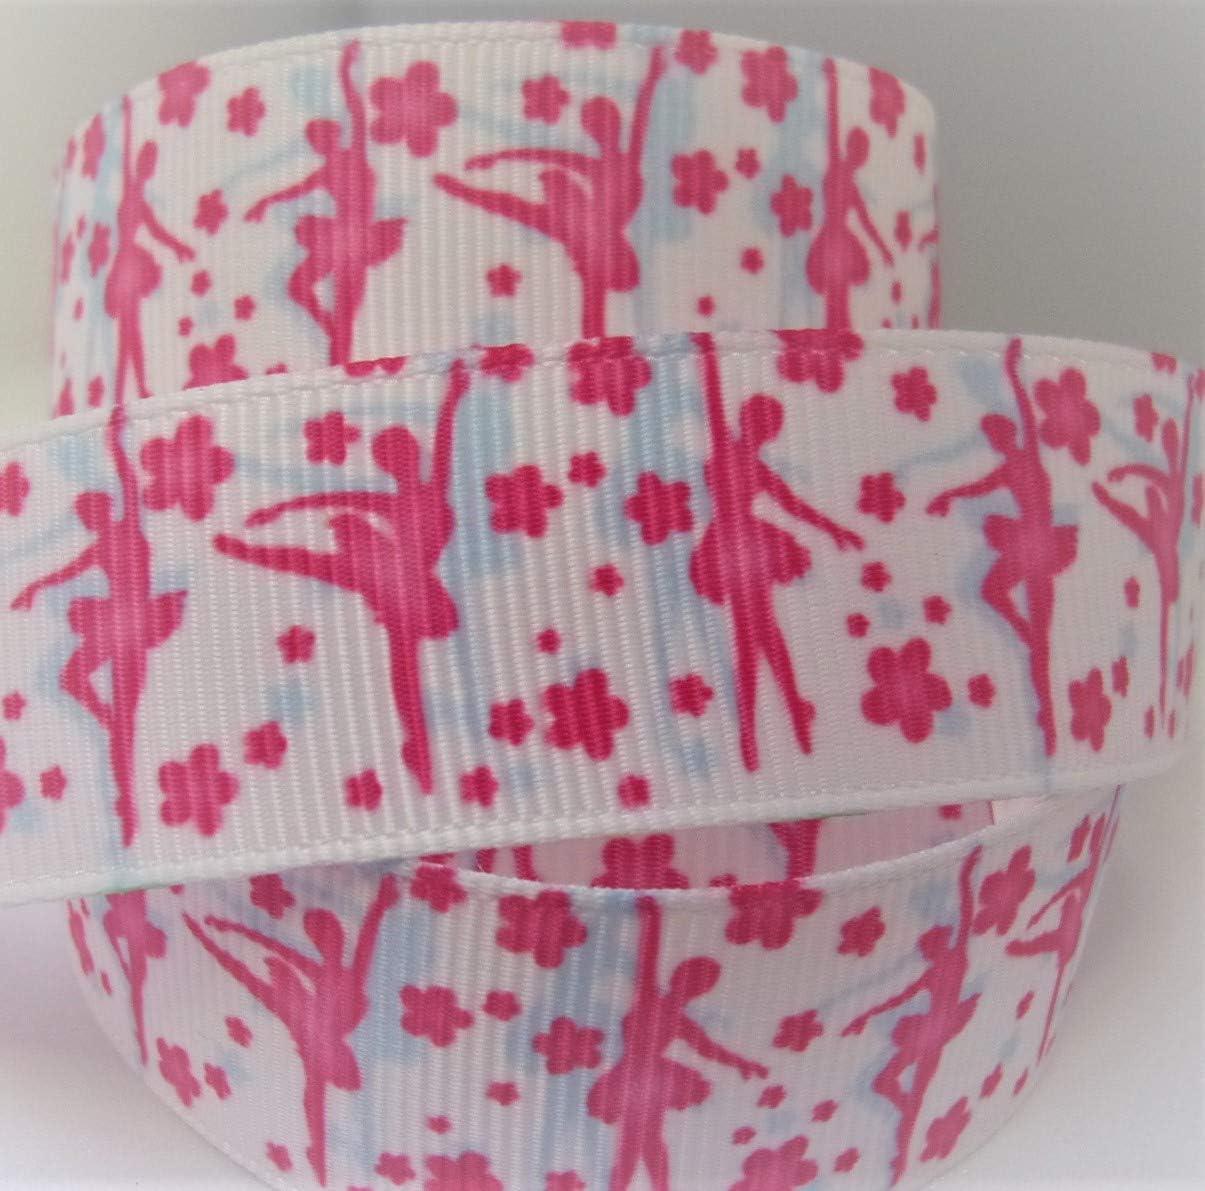 Grosgrain Ribbon - Pink Ballerina Print - 7/8